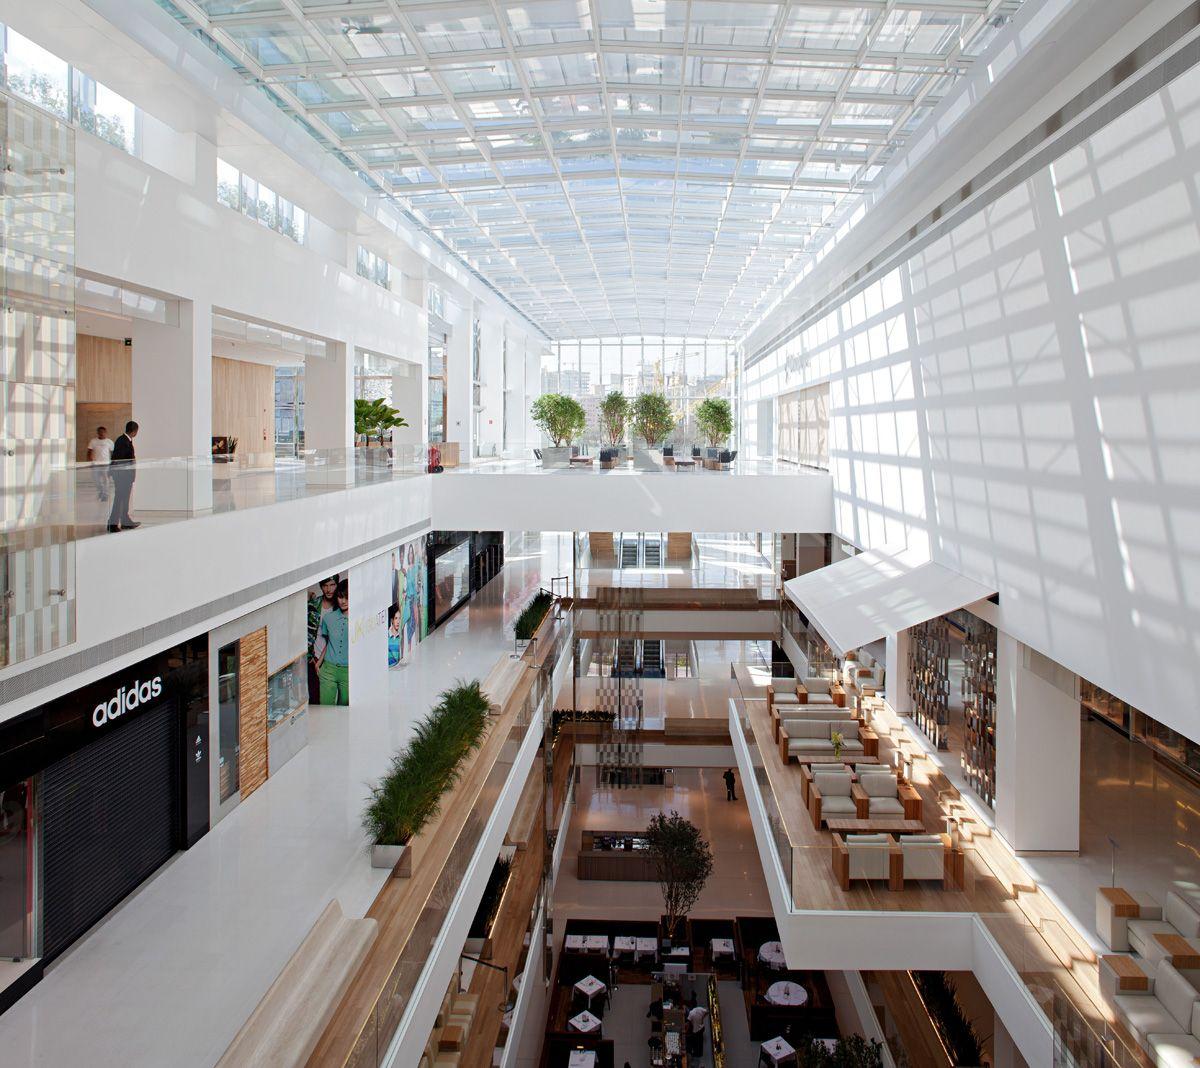 40b3ec1fc22 JK Iguatemi is the most luxurious mall in the financial heart of São Paulo